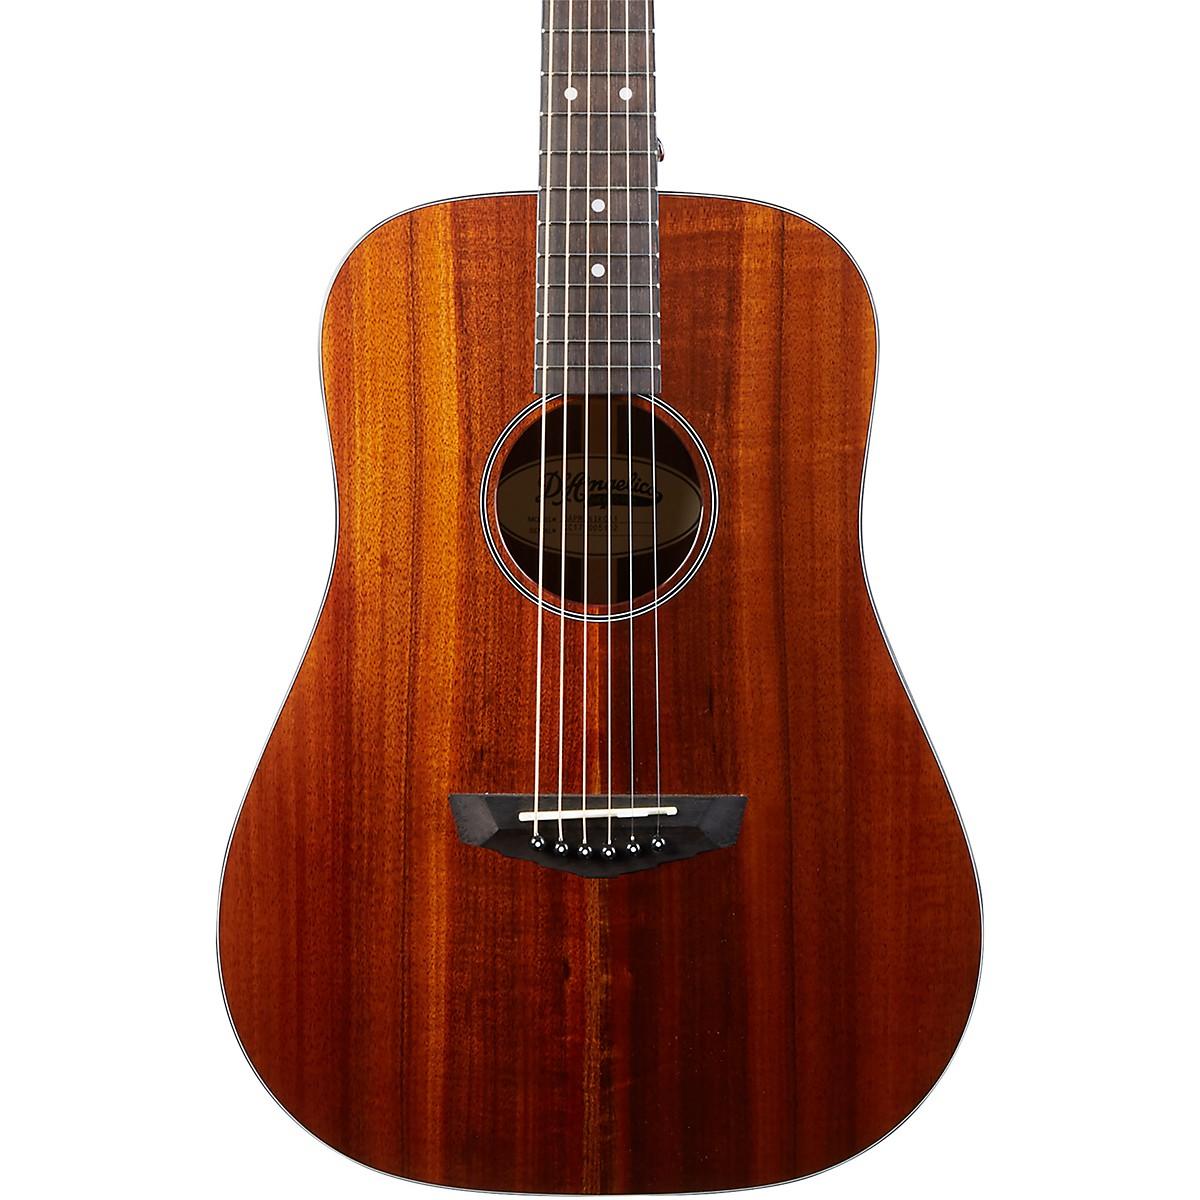 D'Angelico Premier Niagara Solid Koa Top Mini Dreadnought Acoustic Guitar